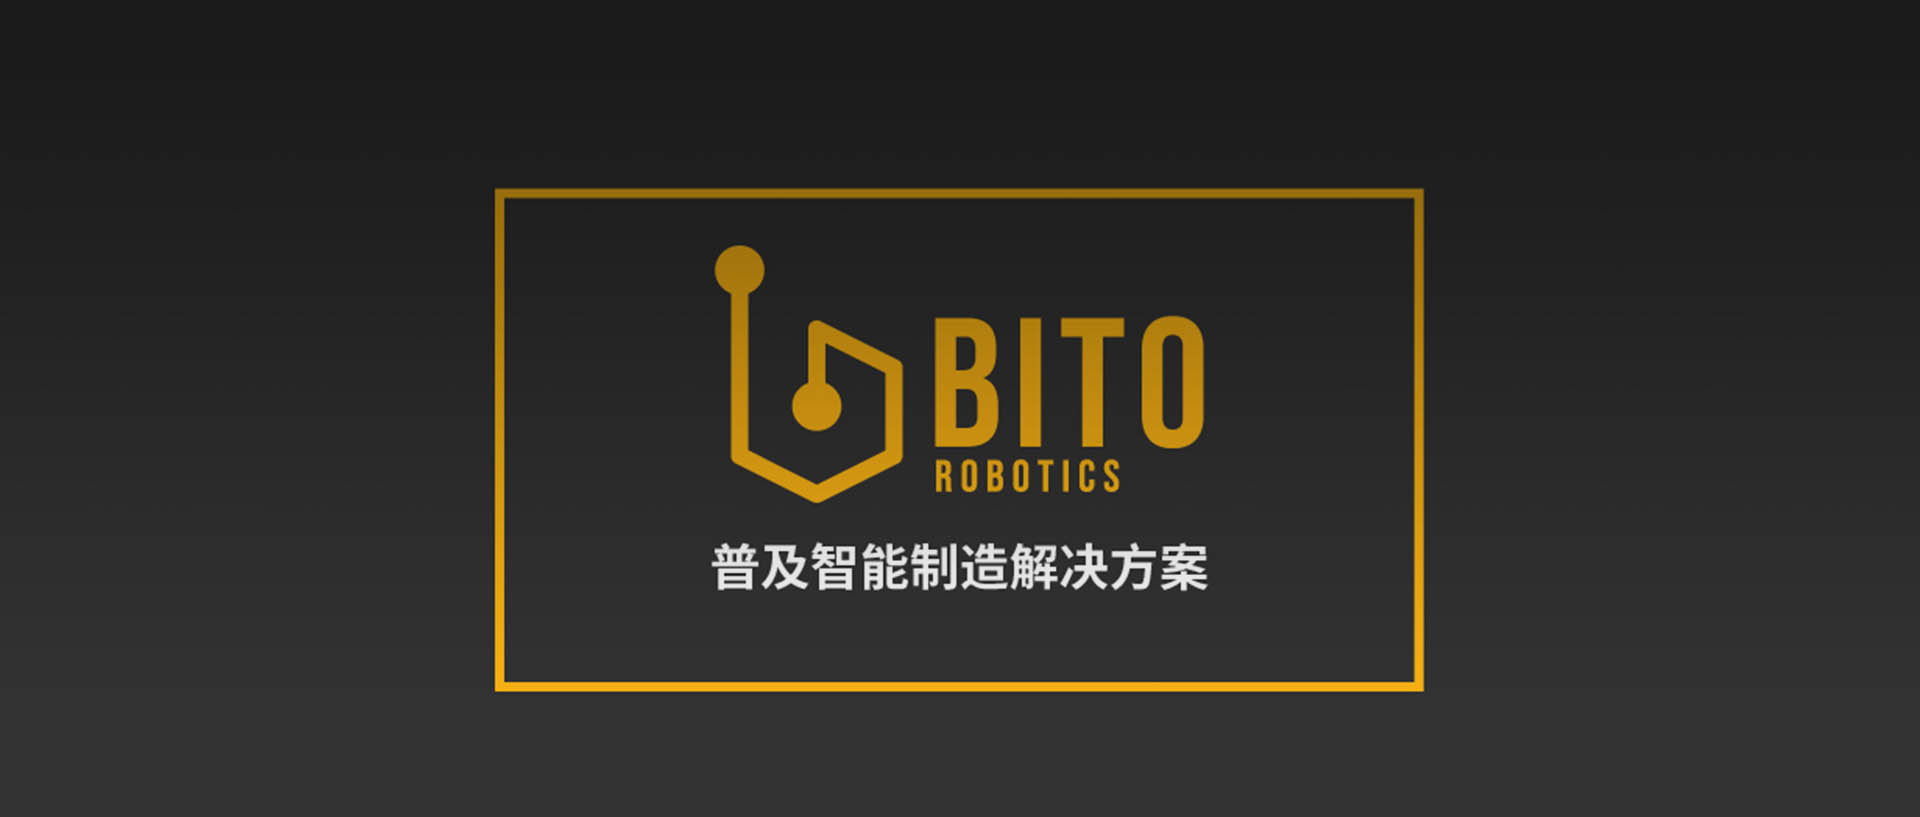 "BITO受邀参加闵行区""创新驱动制造企业转型升级""交流活动"